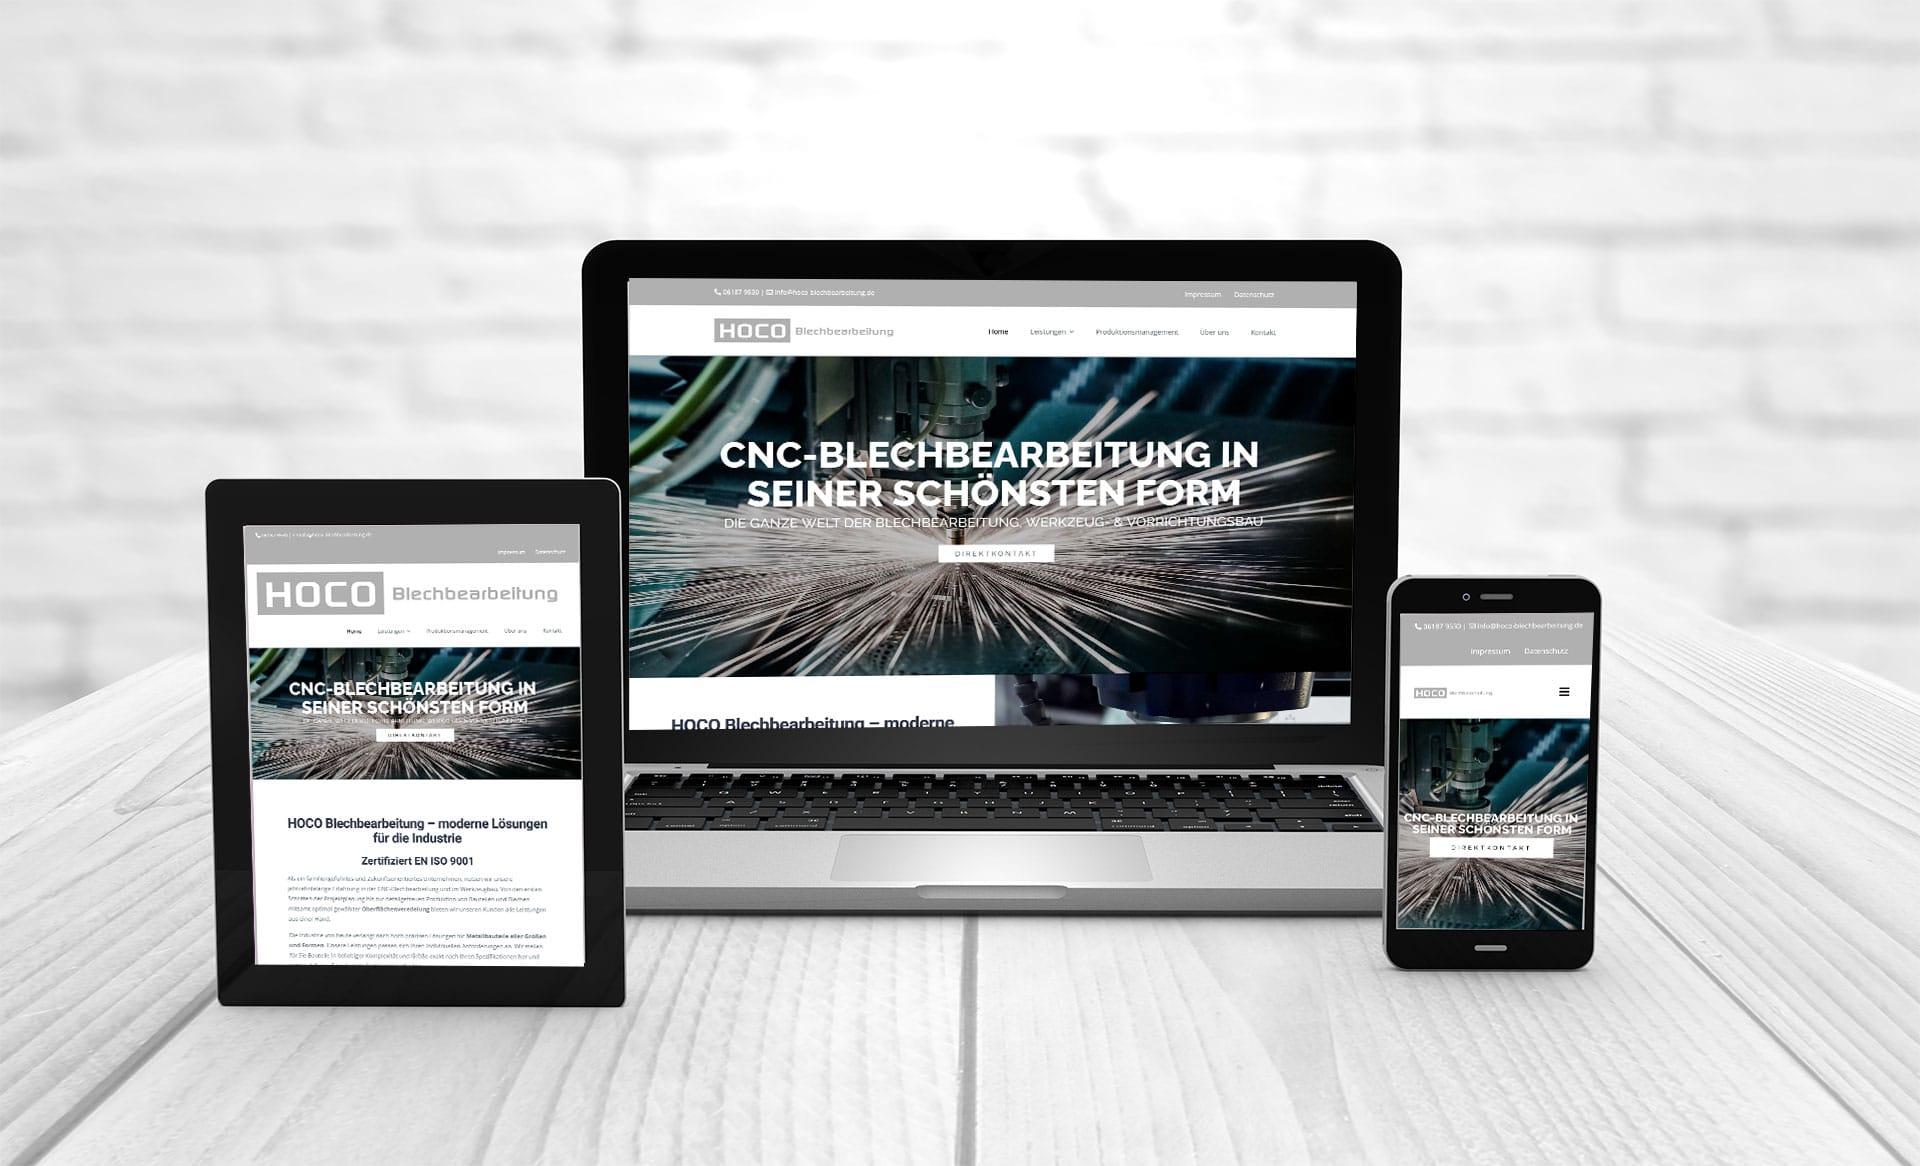 Professional web design, Hoffmann GmbH & Co. KG | HOCO sheet metal processing